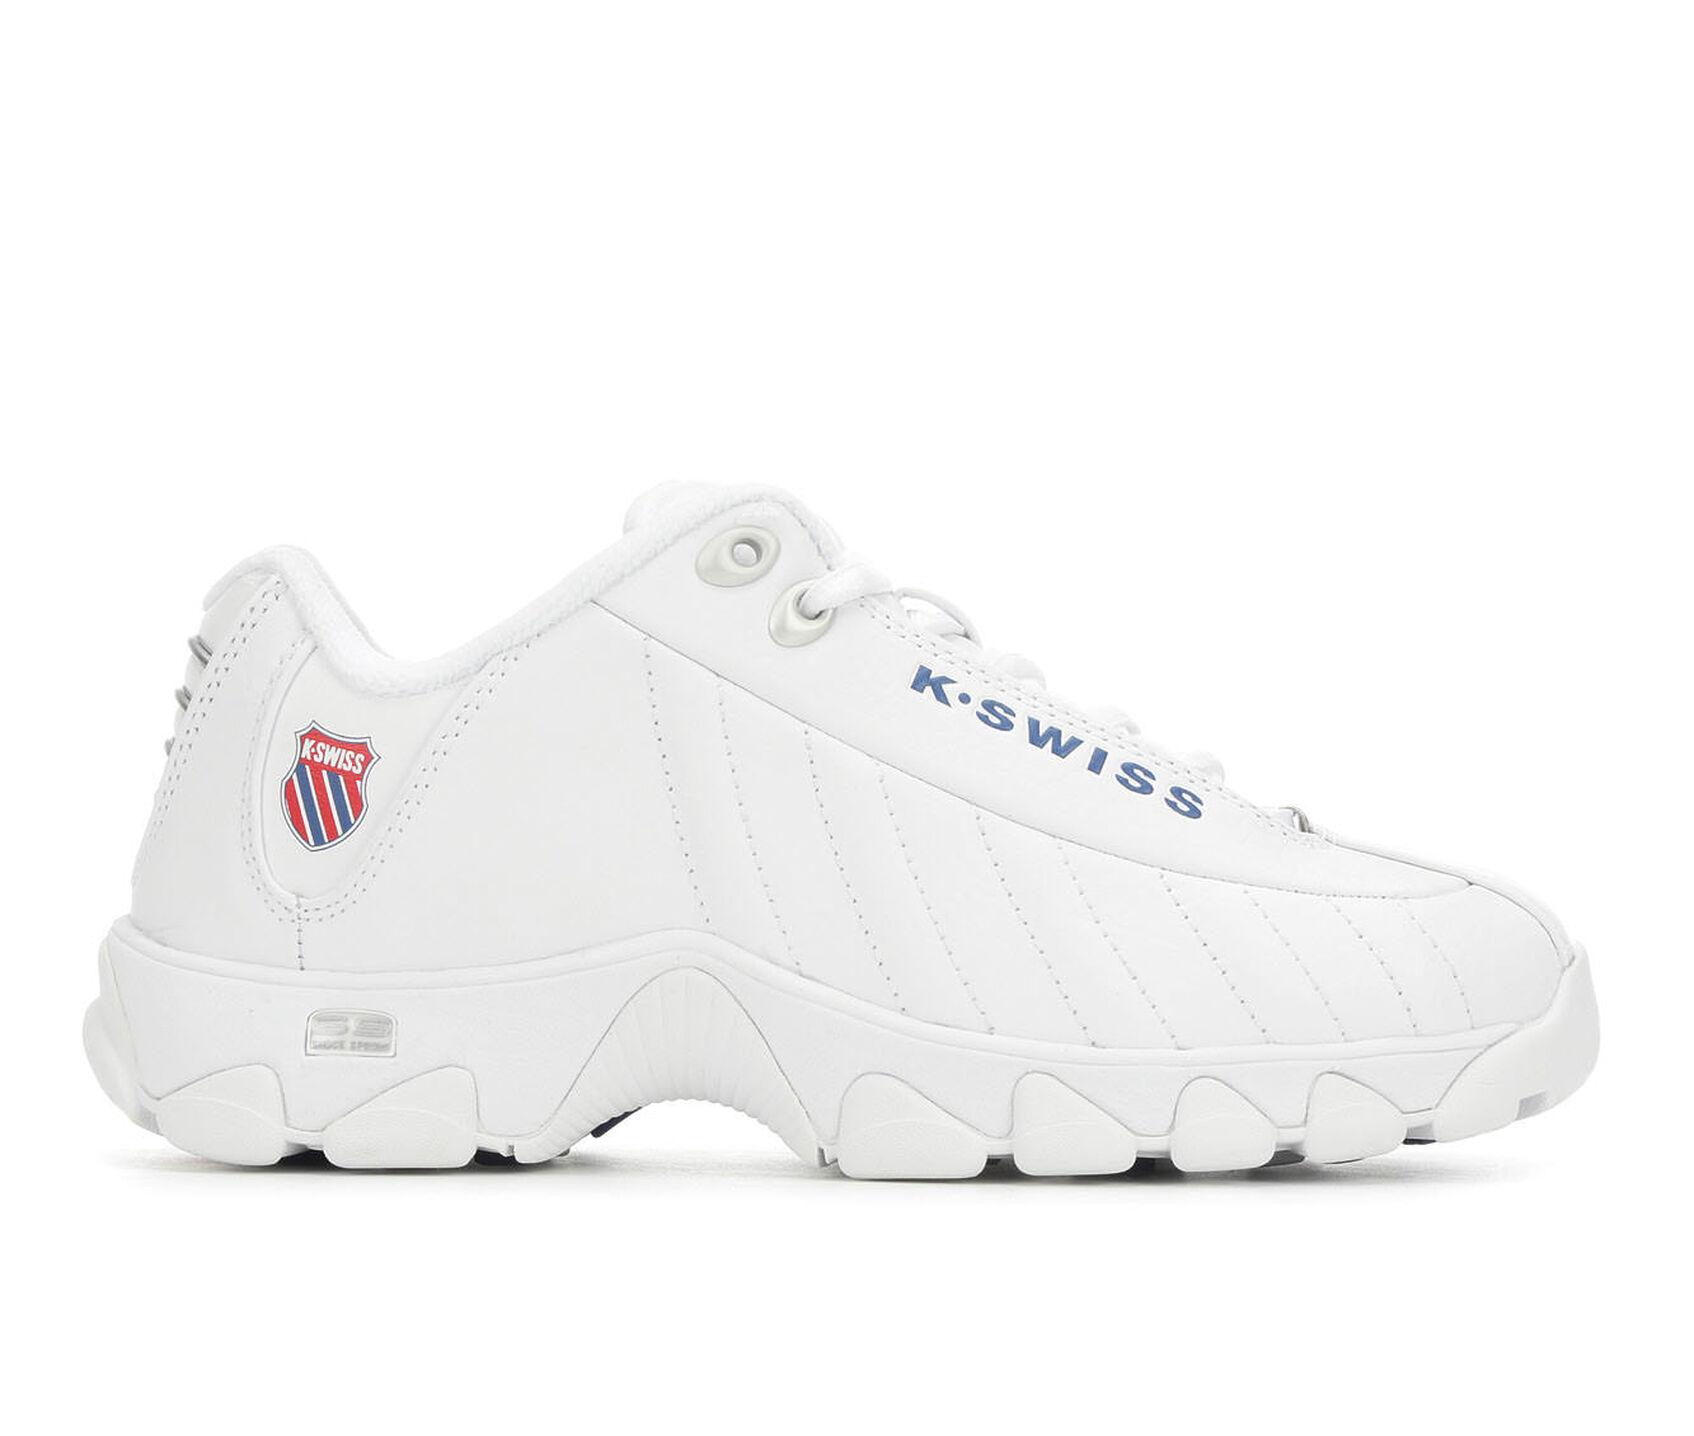 e47902394adb Women s K-Swiss ST329 Comfort Tennis Shoes